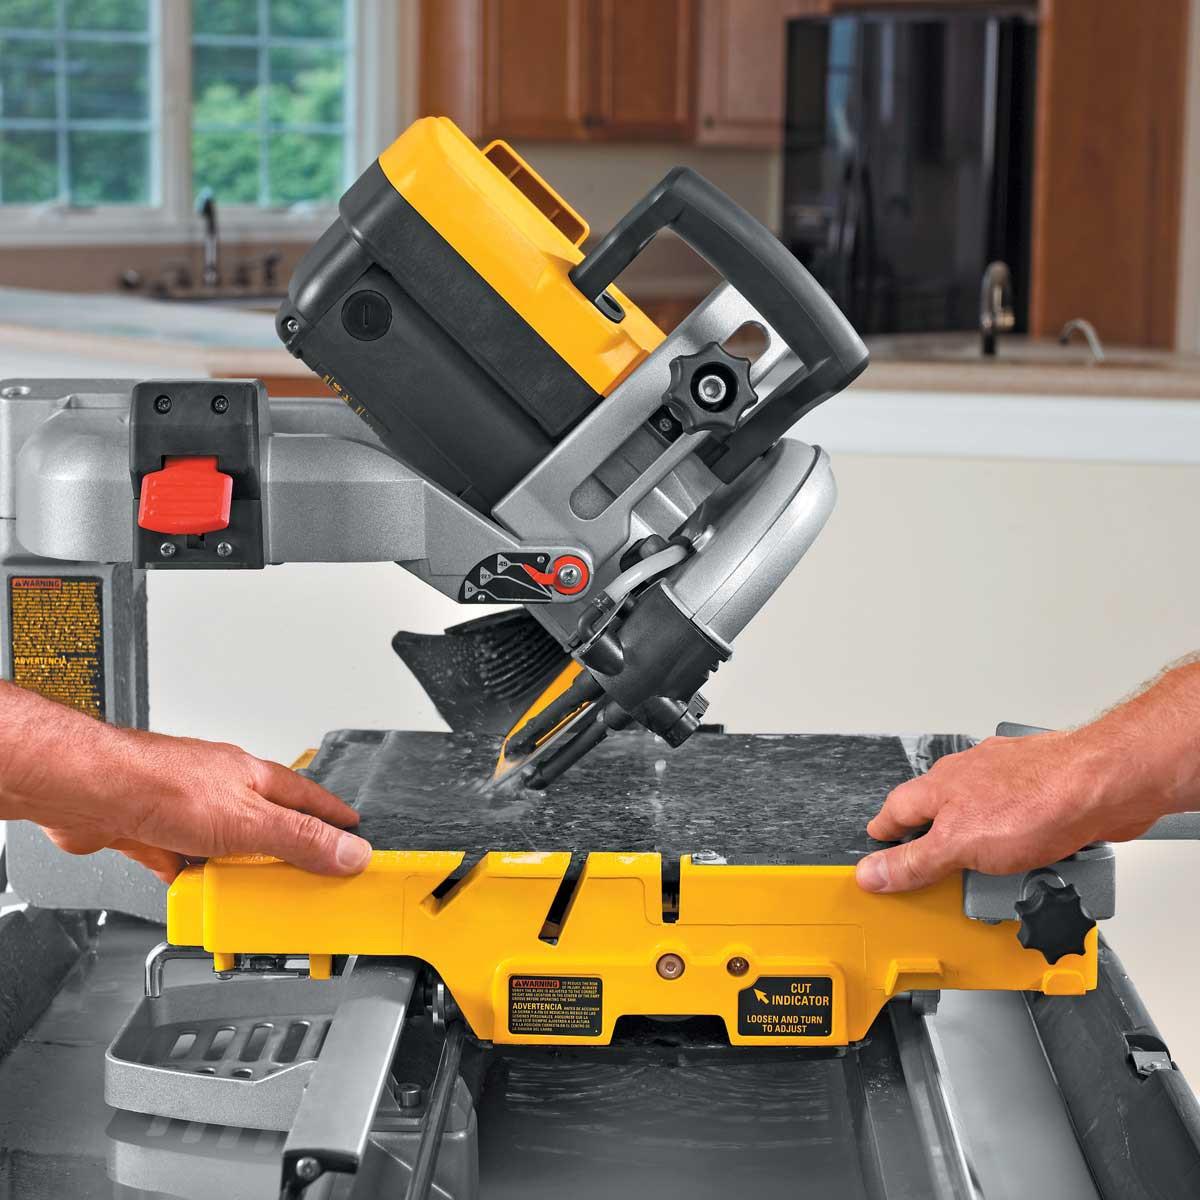 miter cut granite with dewalt saw